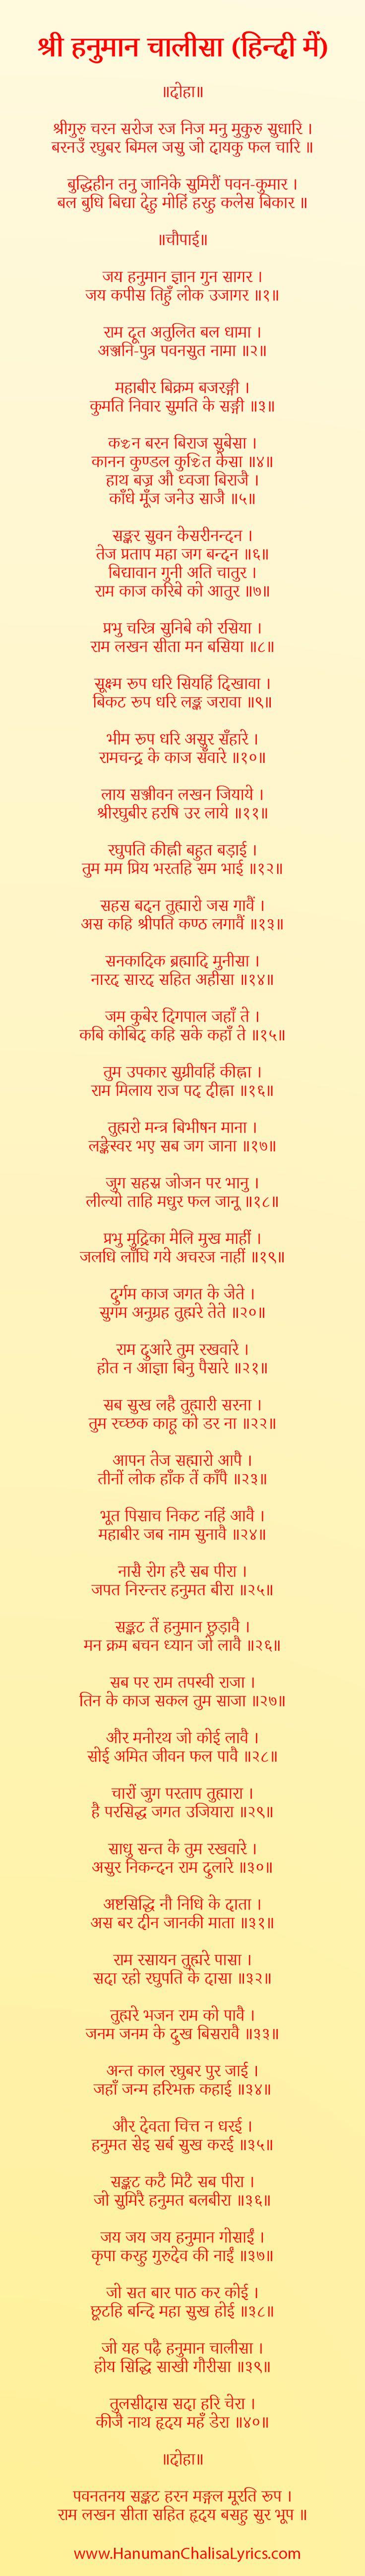 hanuman chalisa in hindi images